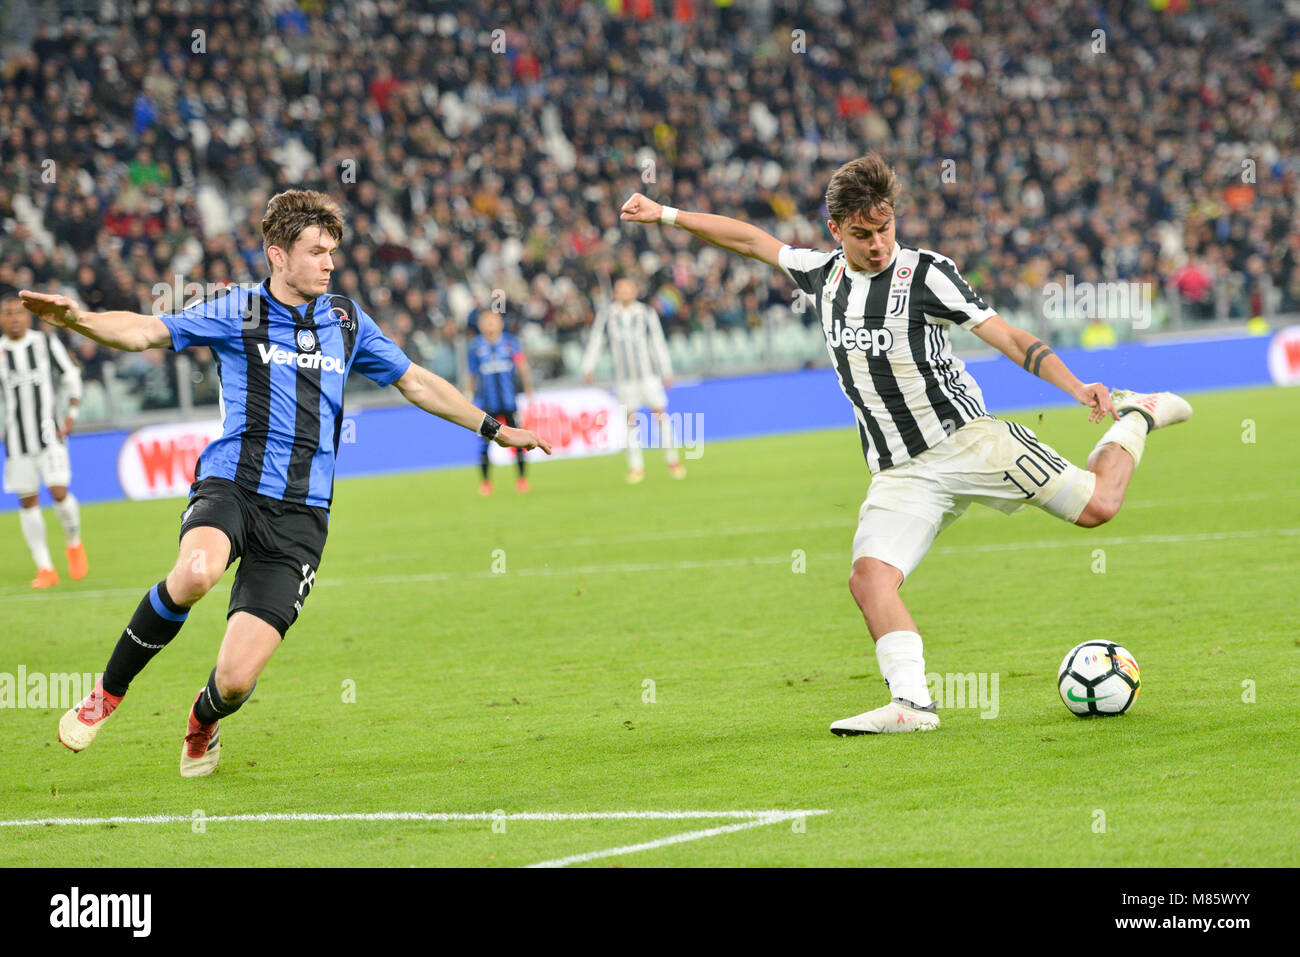 Image Result For Bologna Vs Juventus